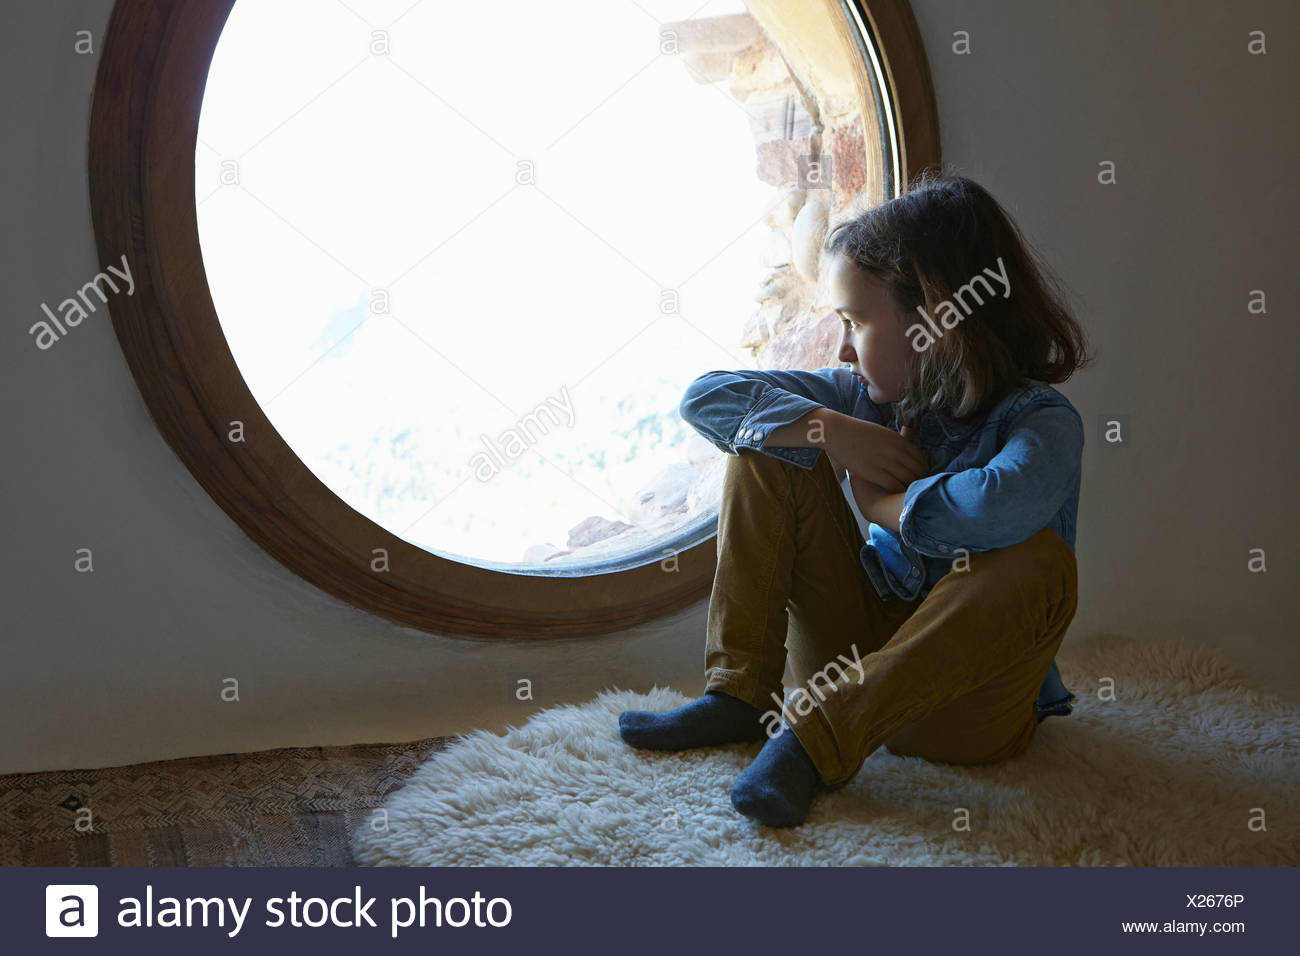 Girl sitting on floor gazing through circular window - Stock Image